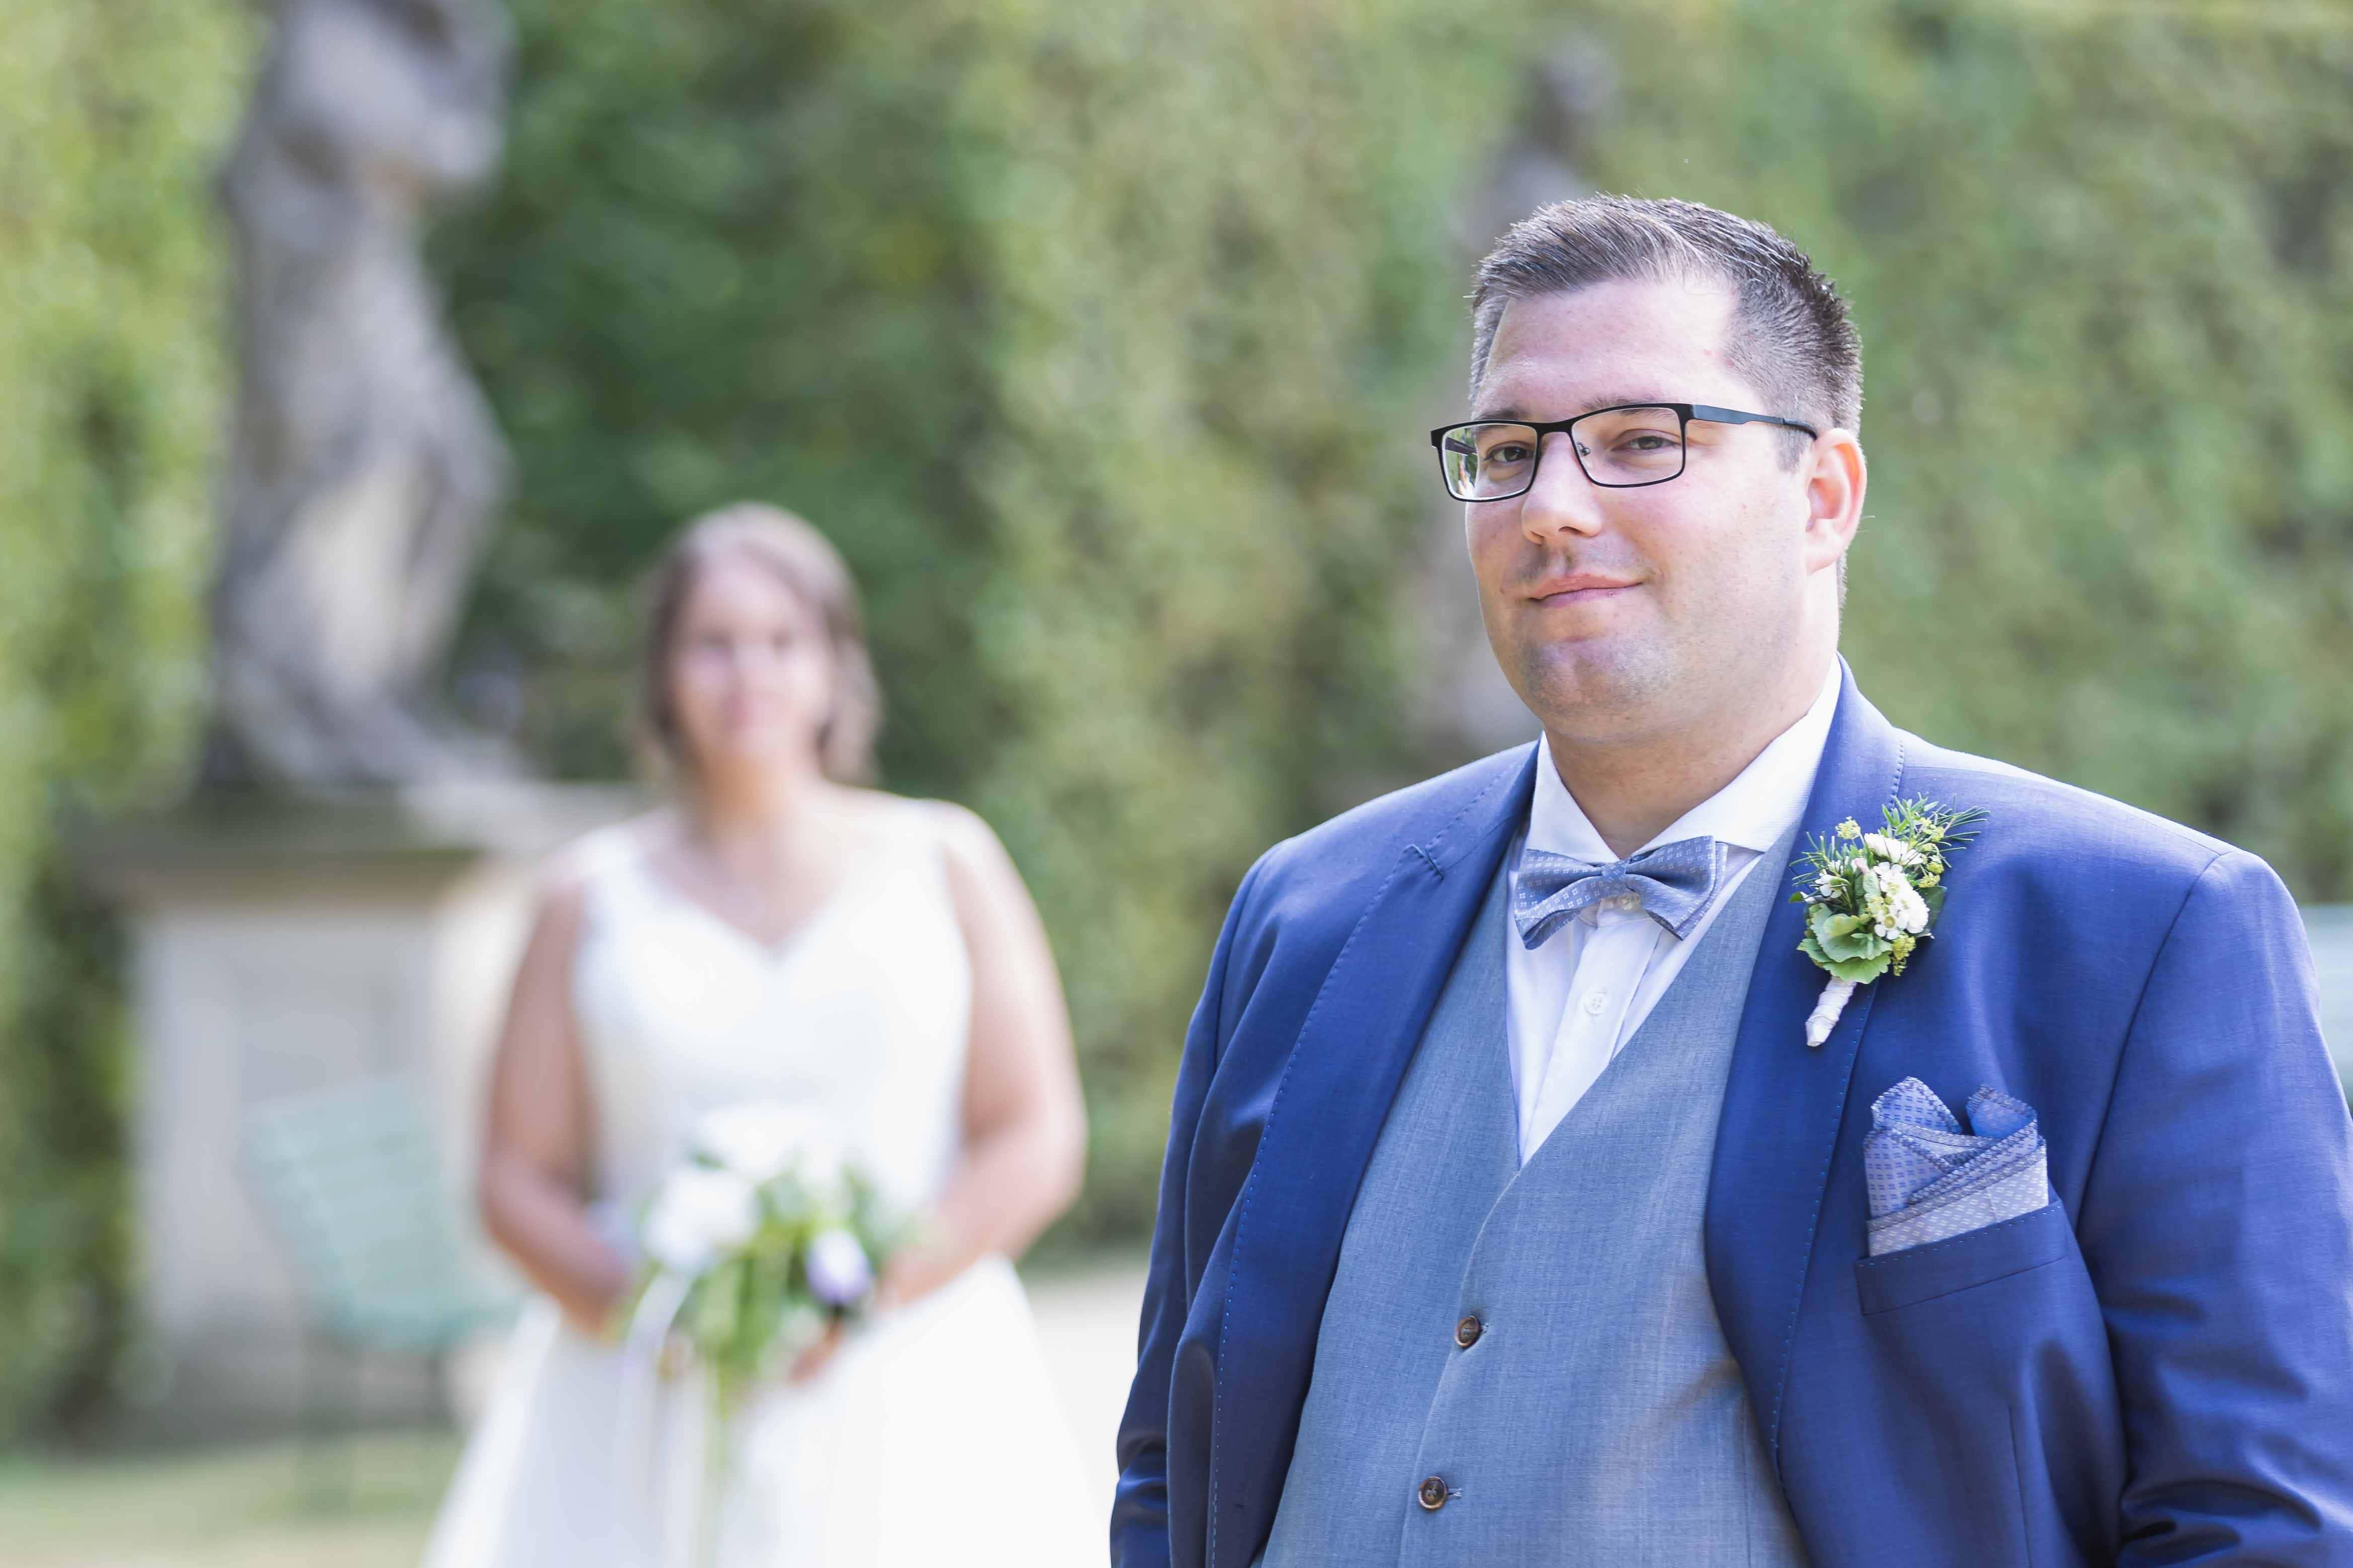 Fotoshooting Hochzeit Barockgarten